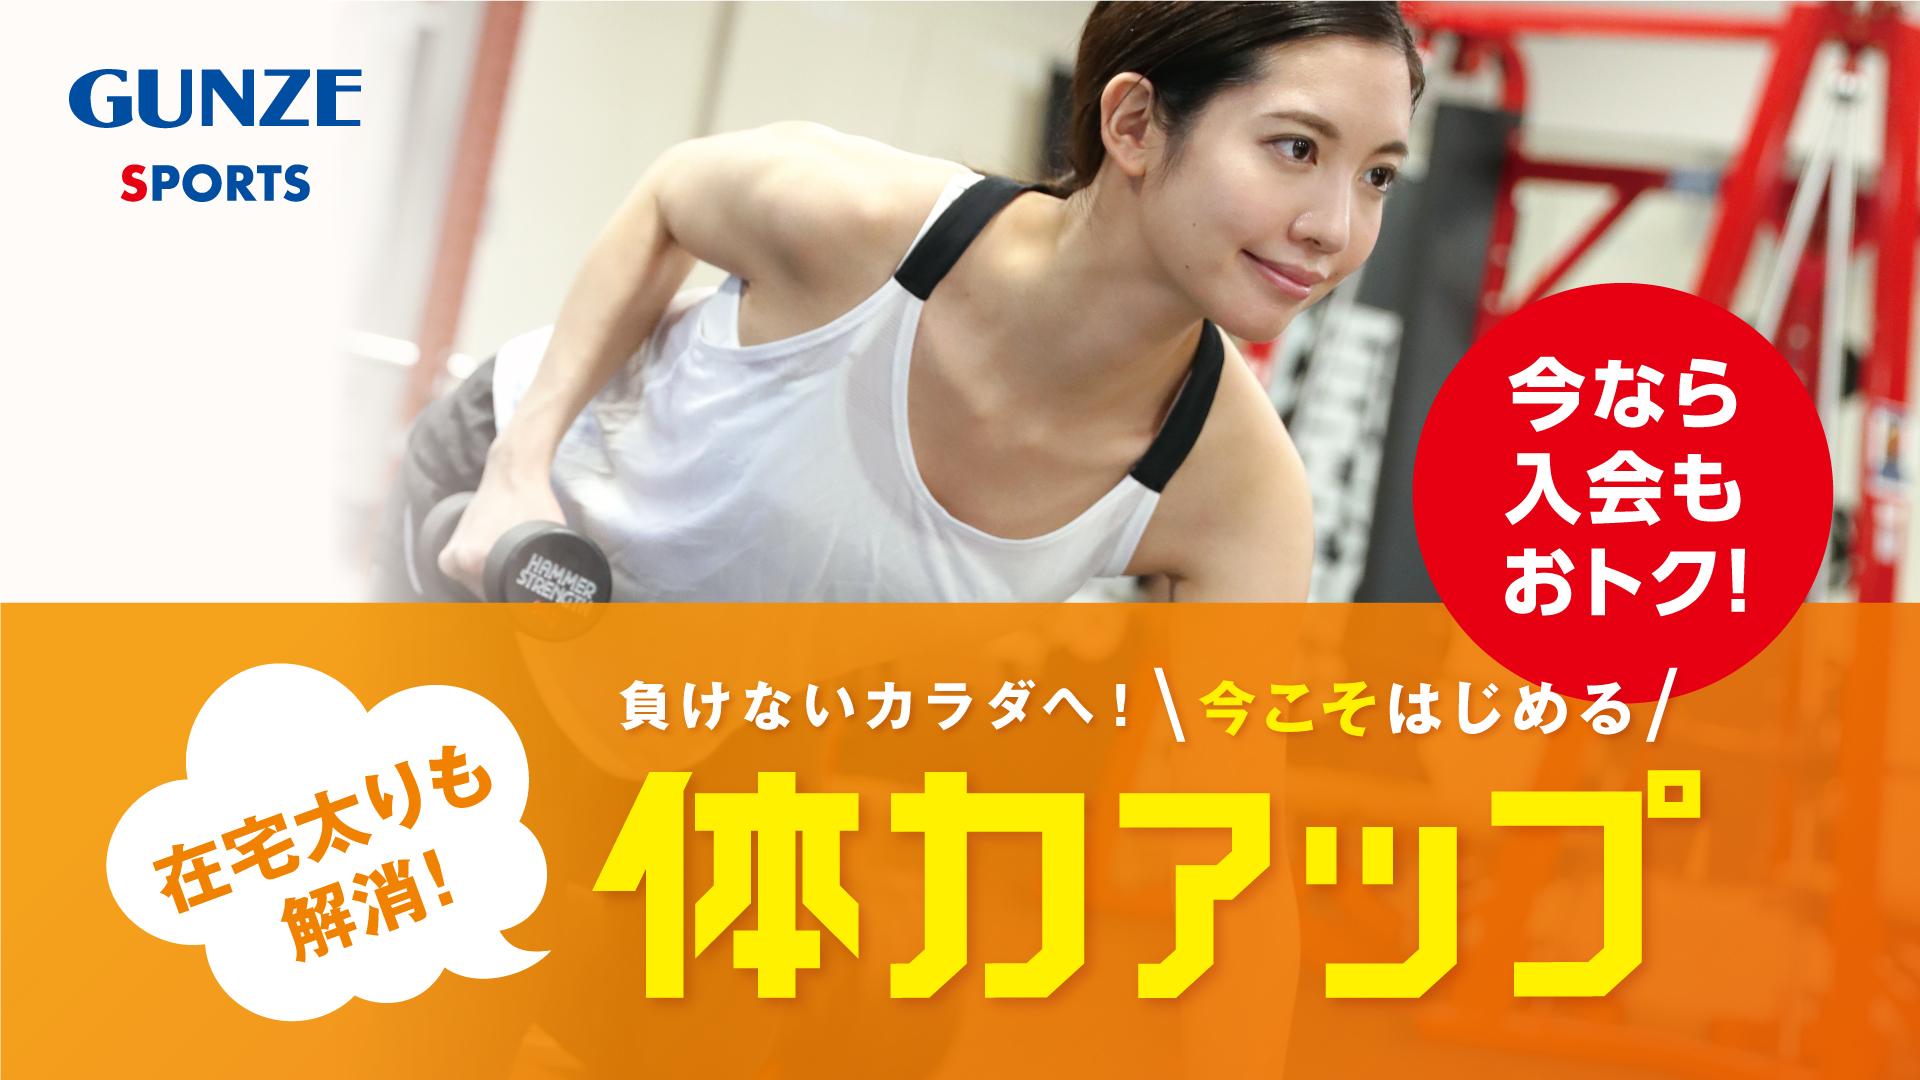 Gunzesports nishiakashi グンゼスポーツ 西明石